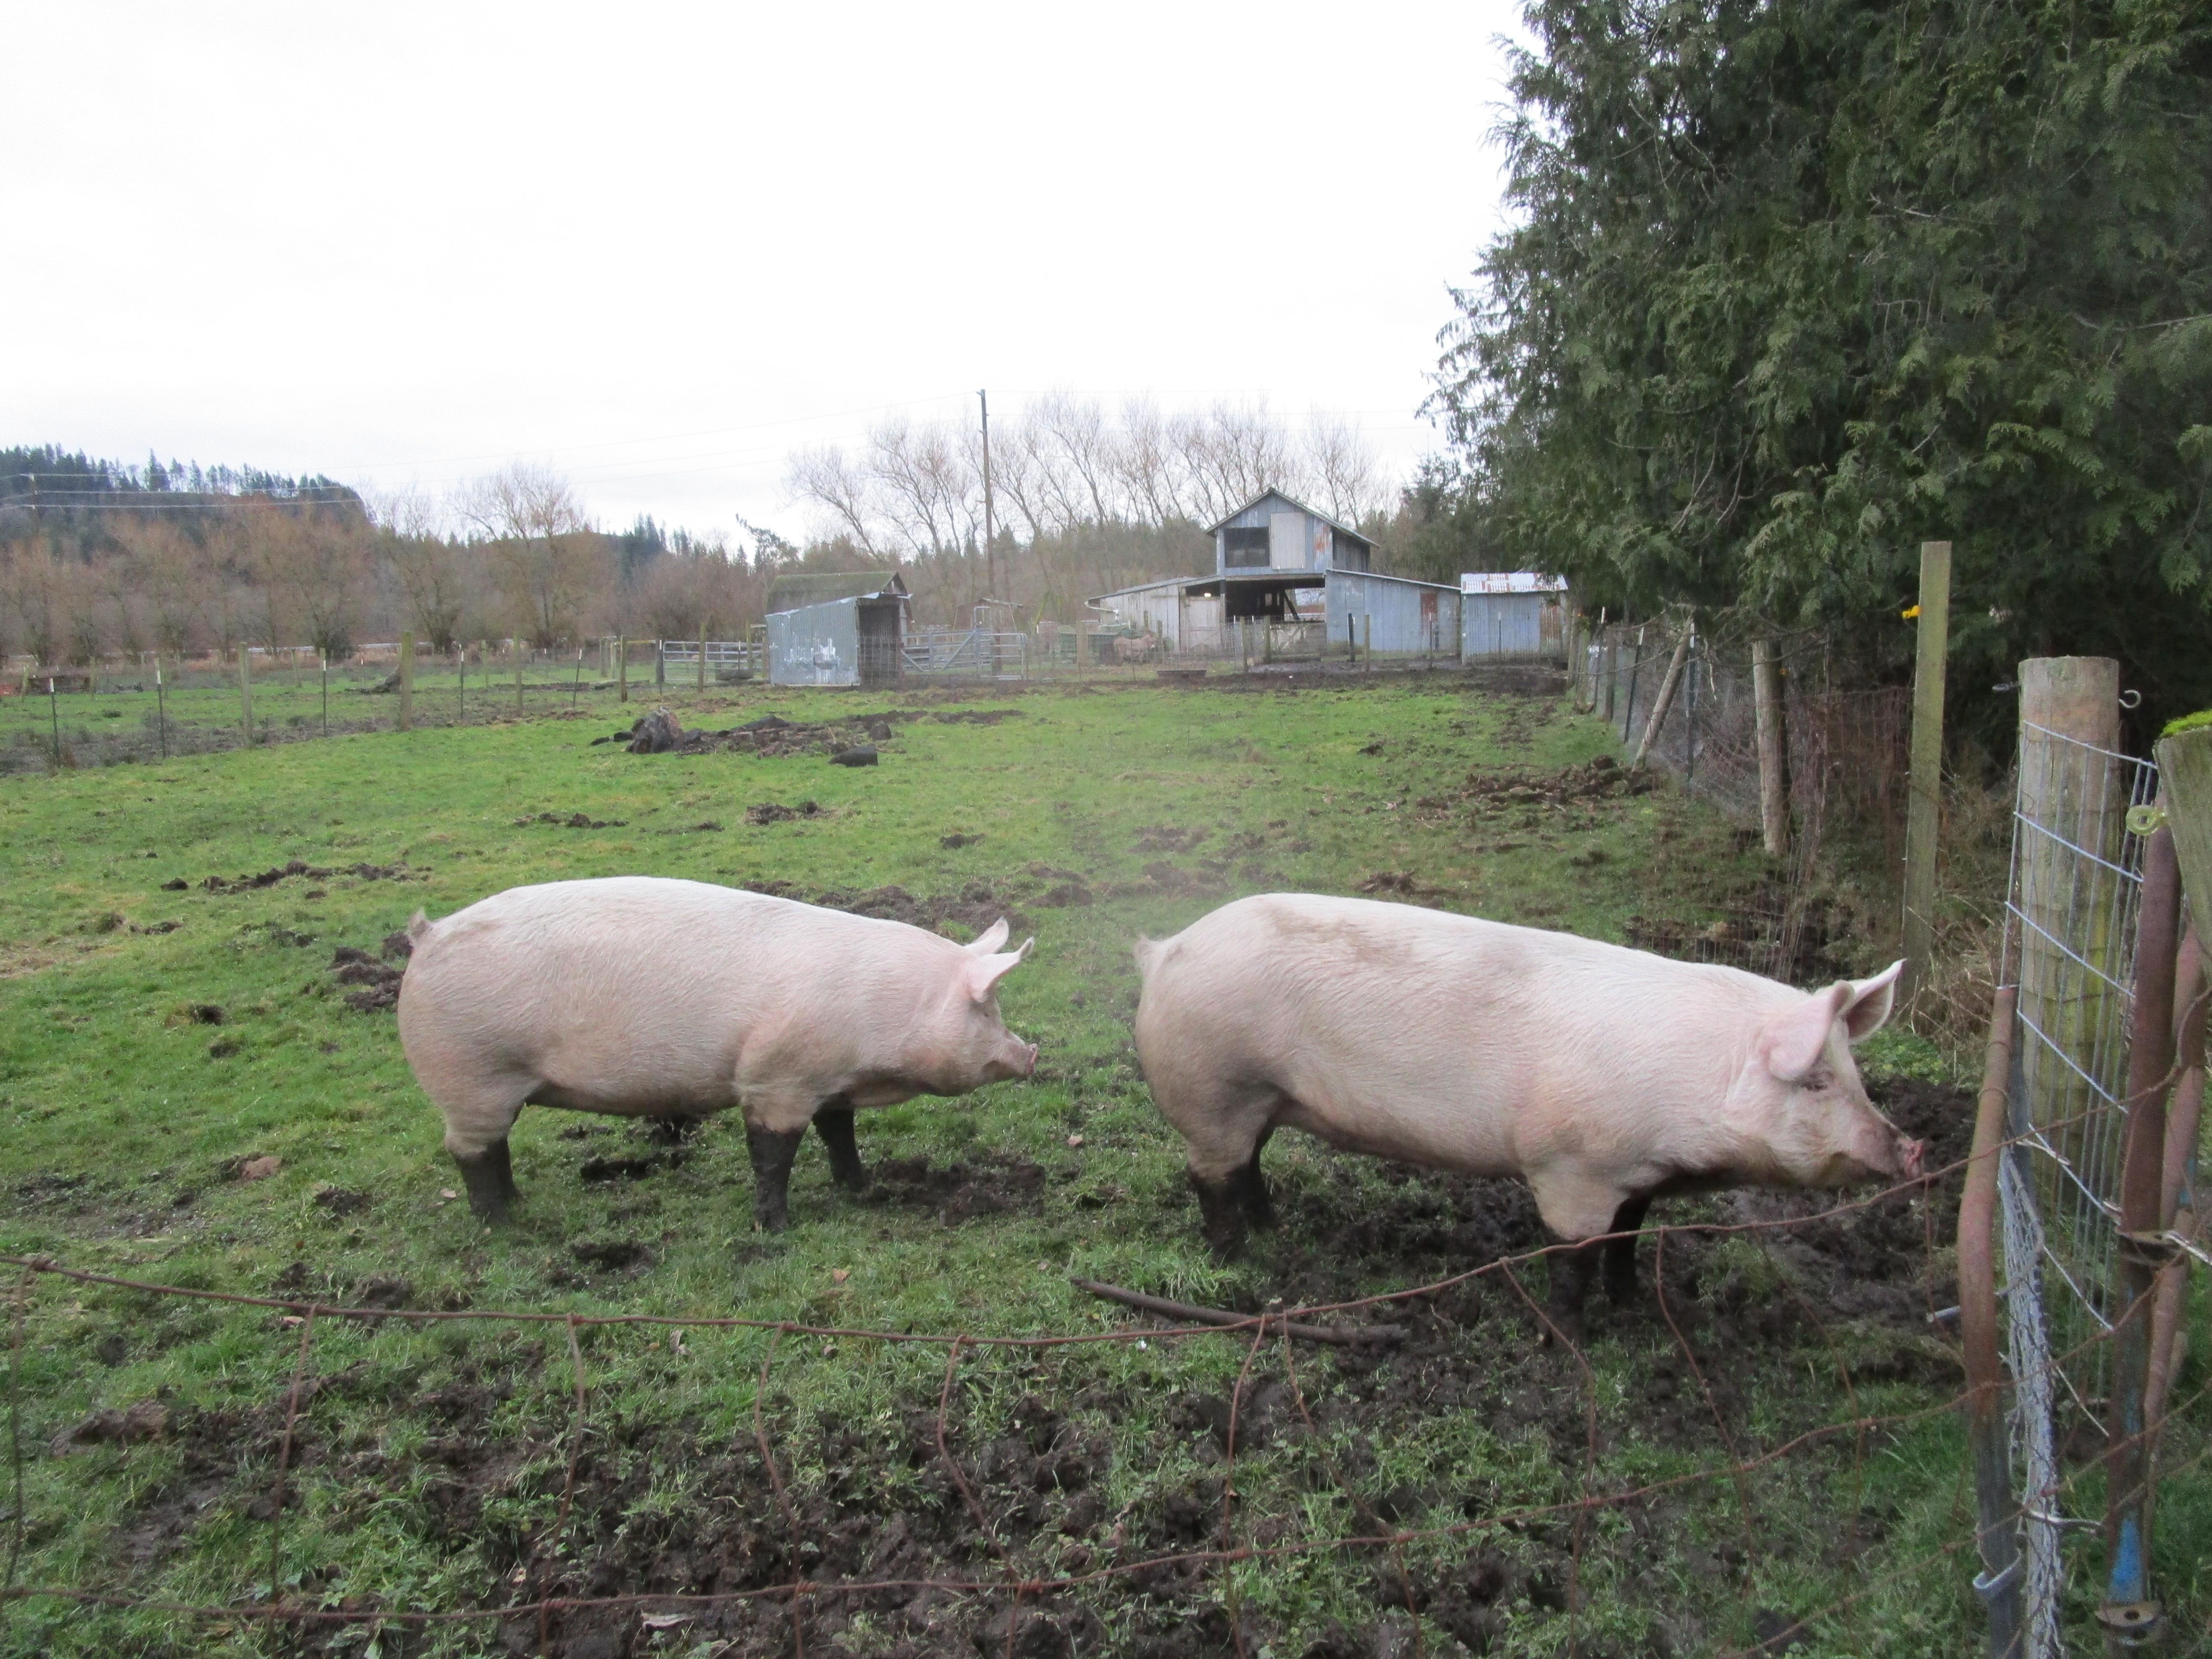 Petunia and Porky